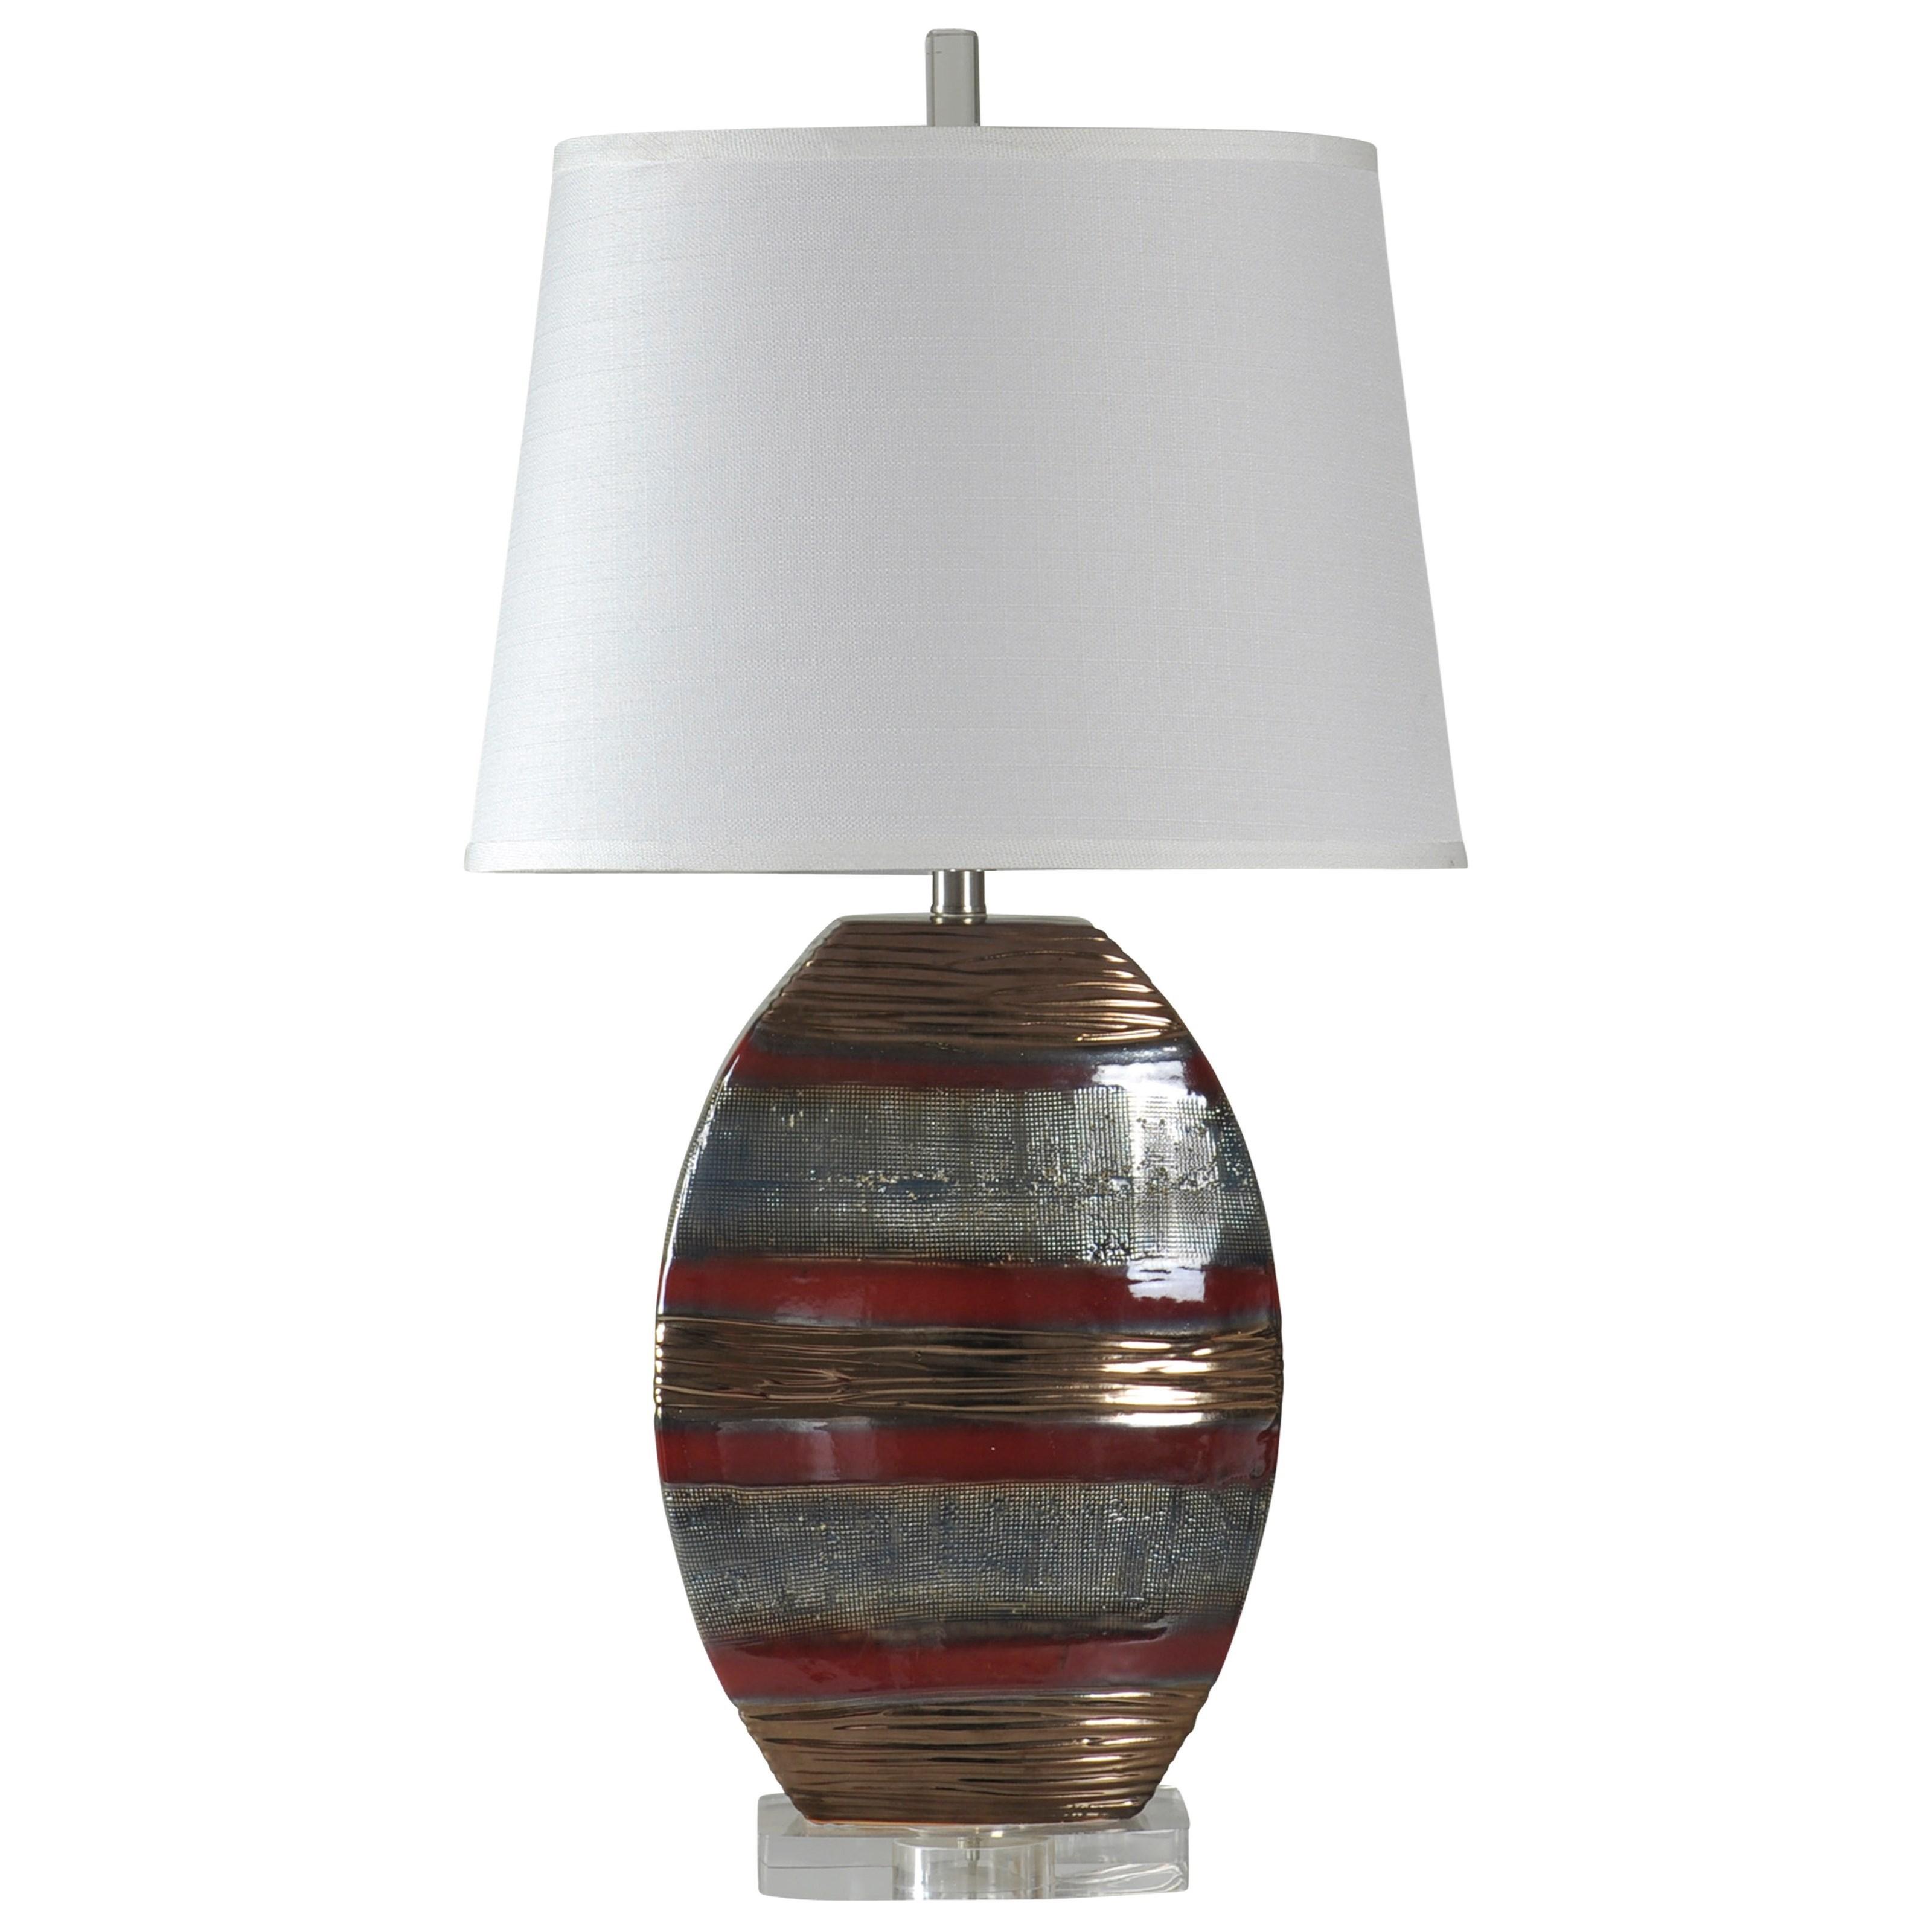 Lamps Earth Tone Ceramic Lamp at Ruby Gordon Home